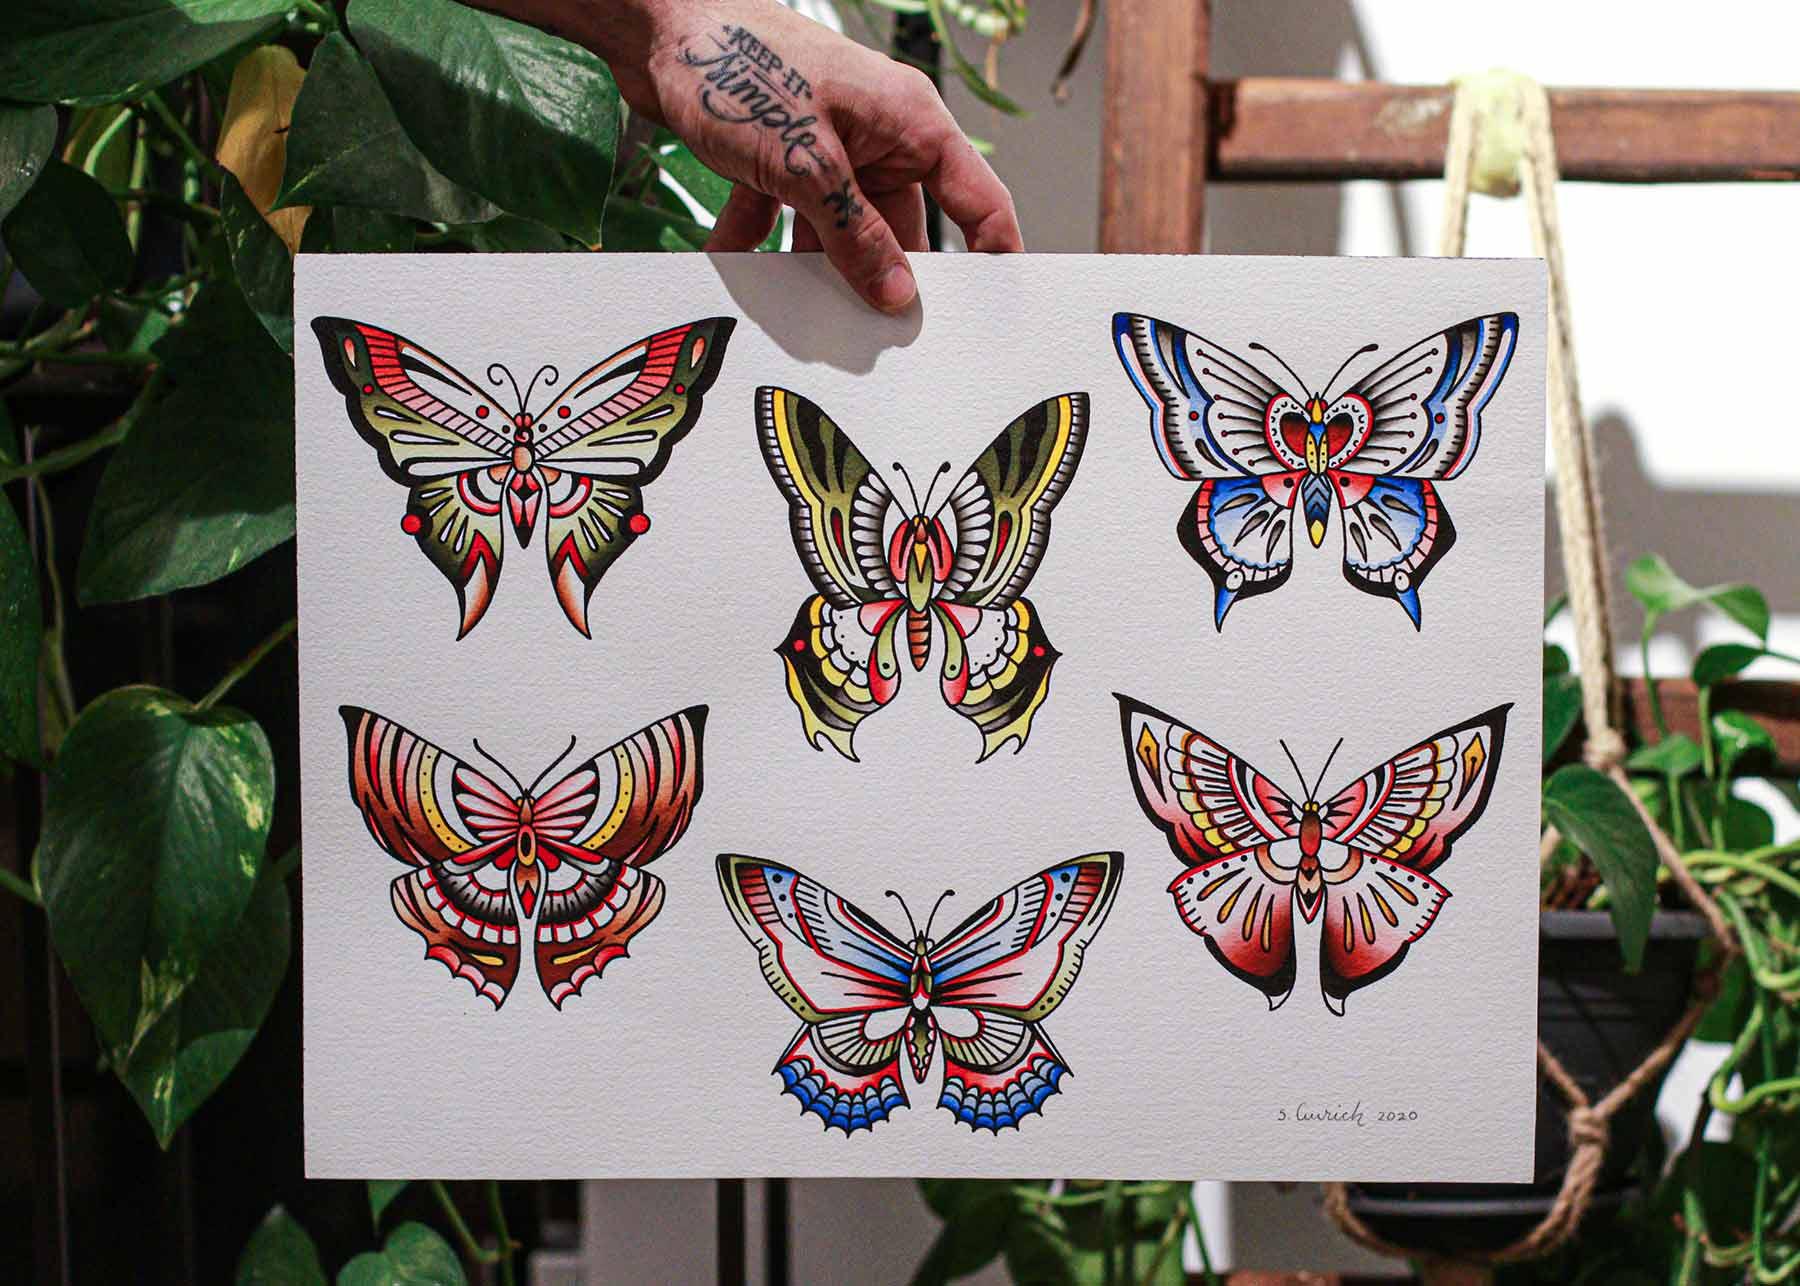 Butterfly flash from Sebastian Aurich